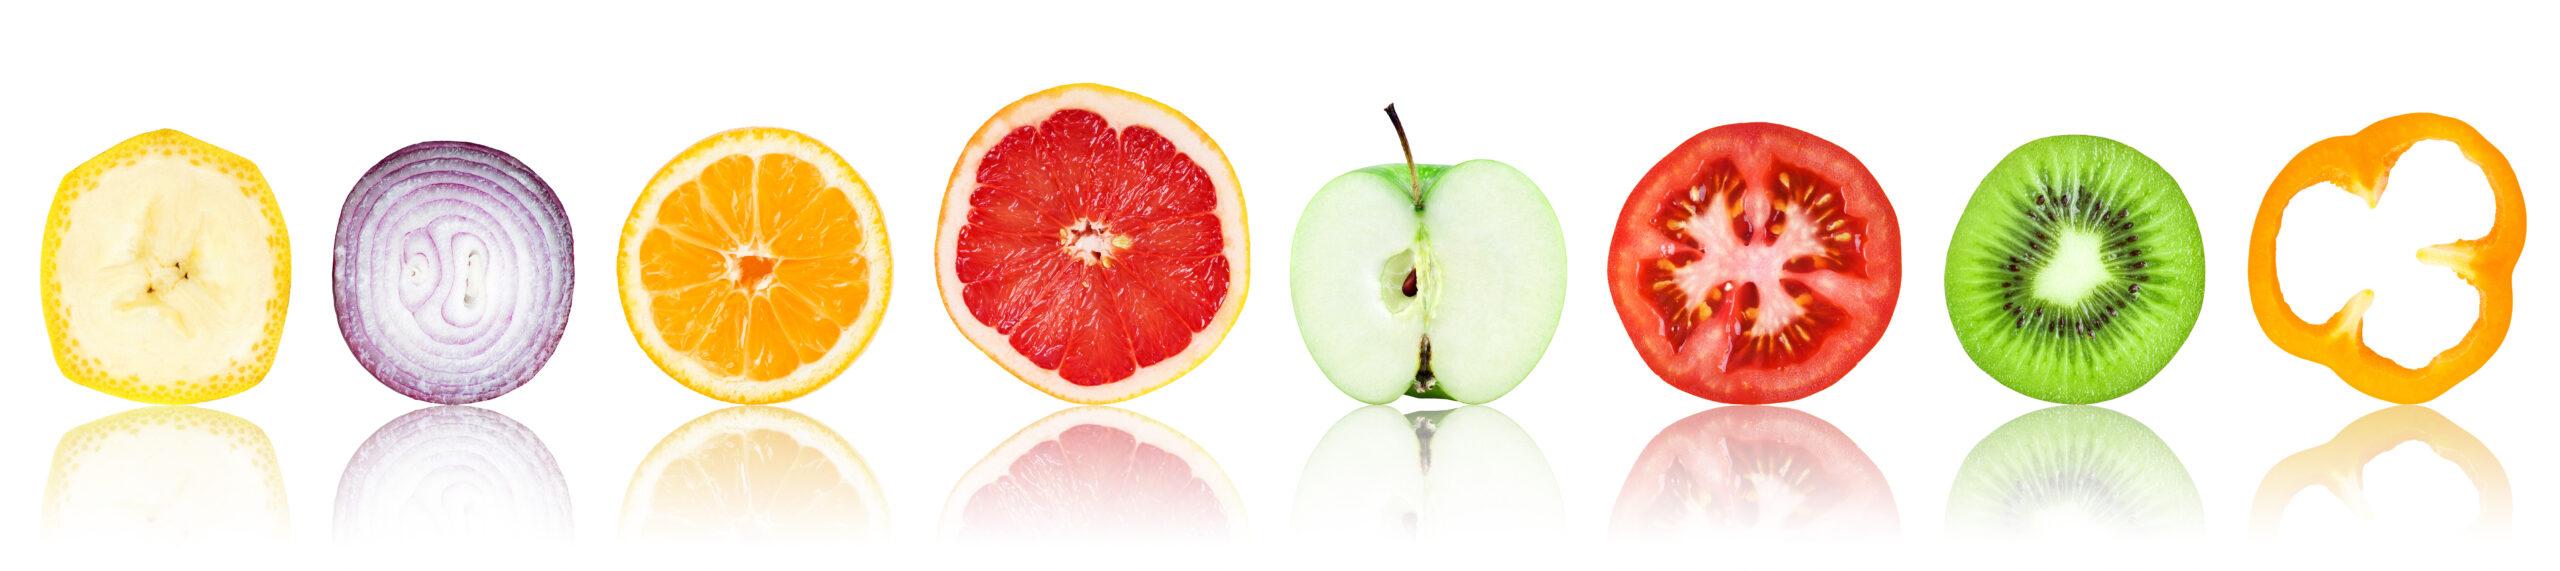 Früchte im Anschnitt